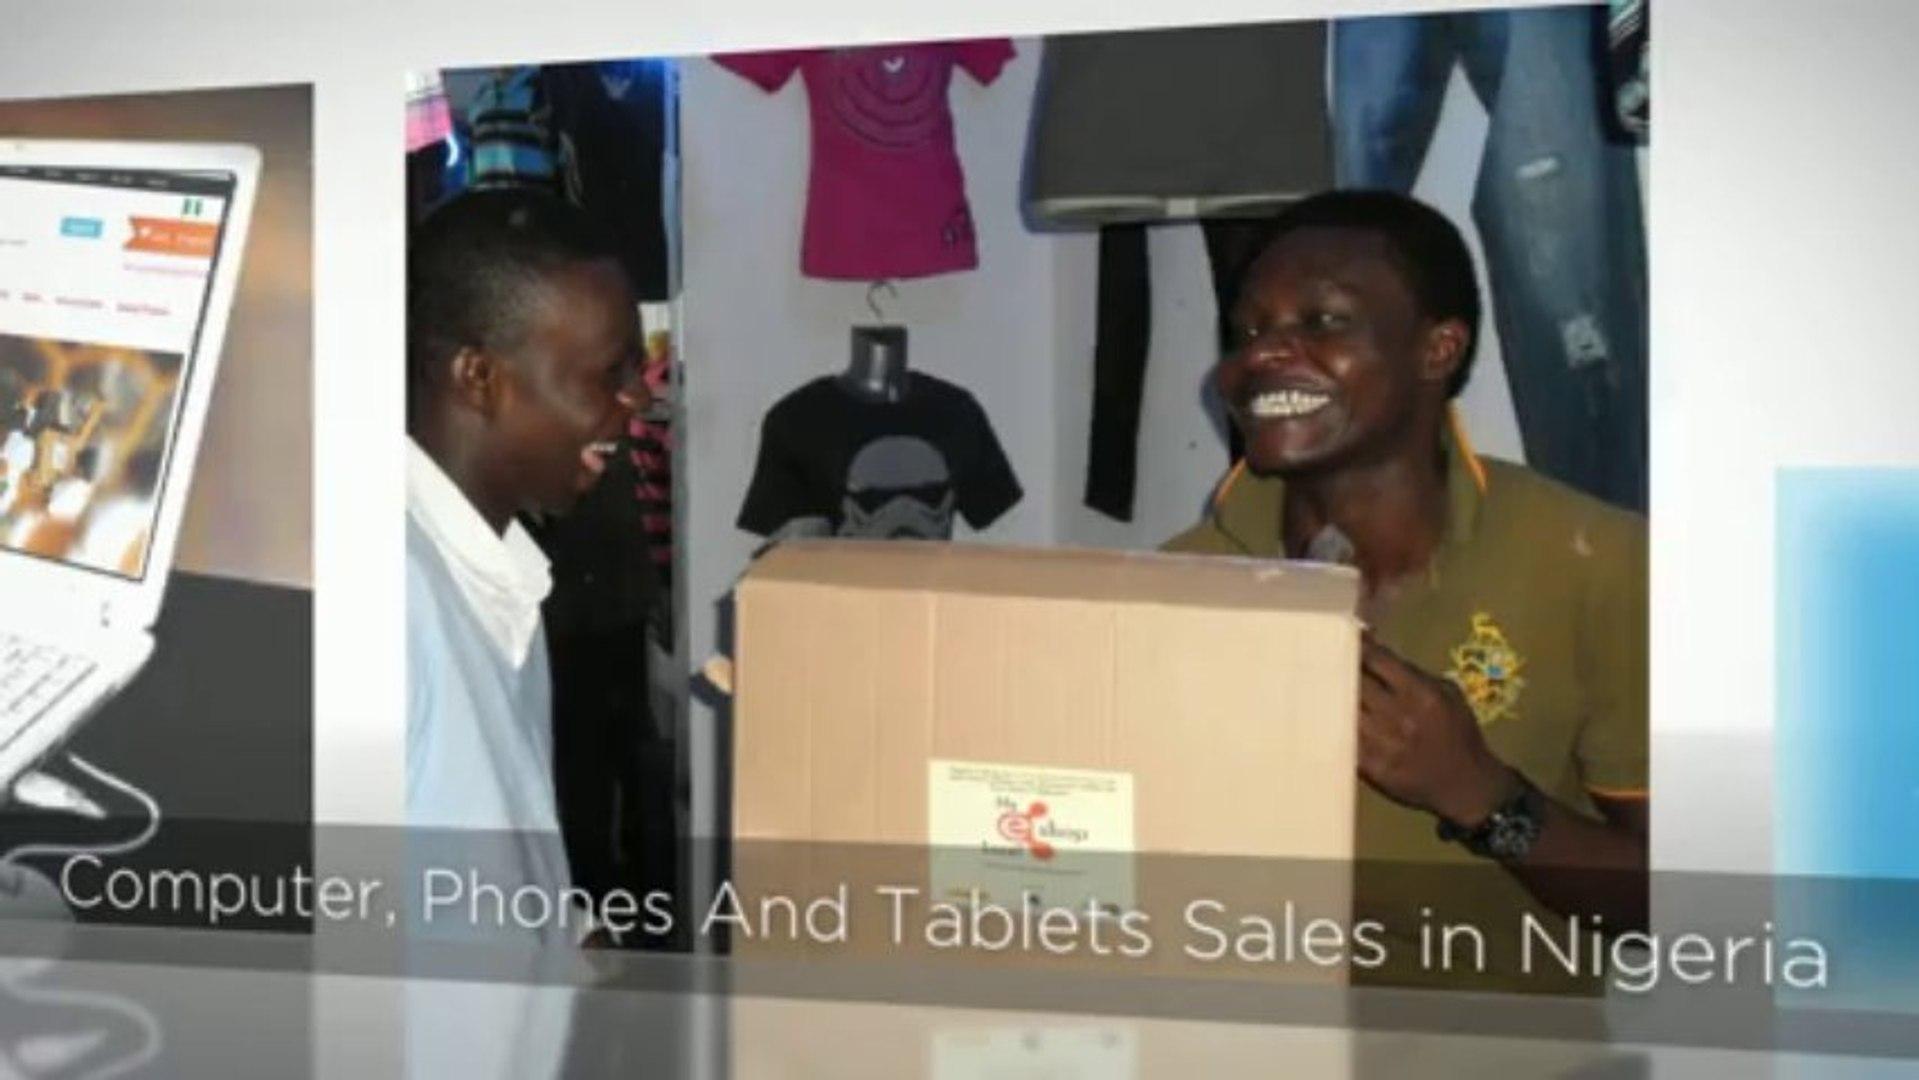 Online Shops in Nigeria | Shopping in Nigeria  - www.mylocaleshop.com